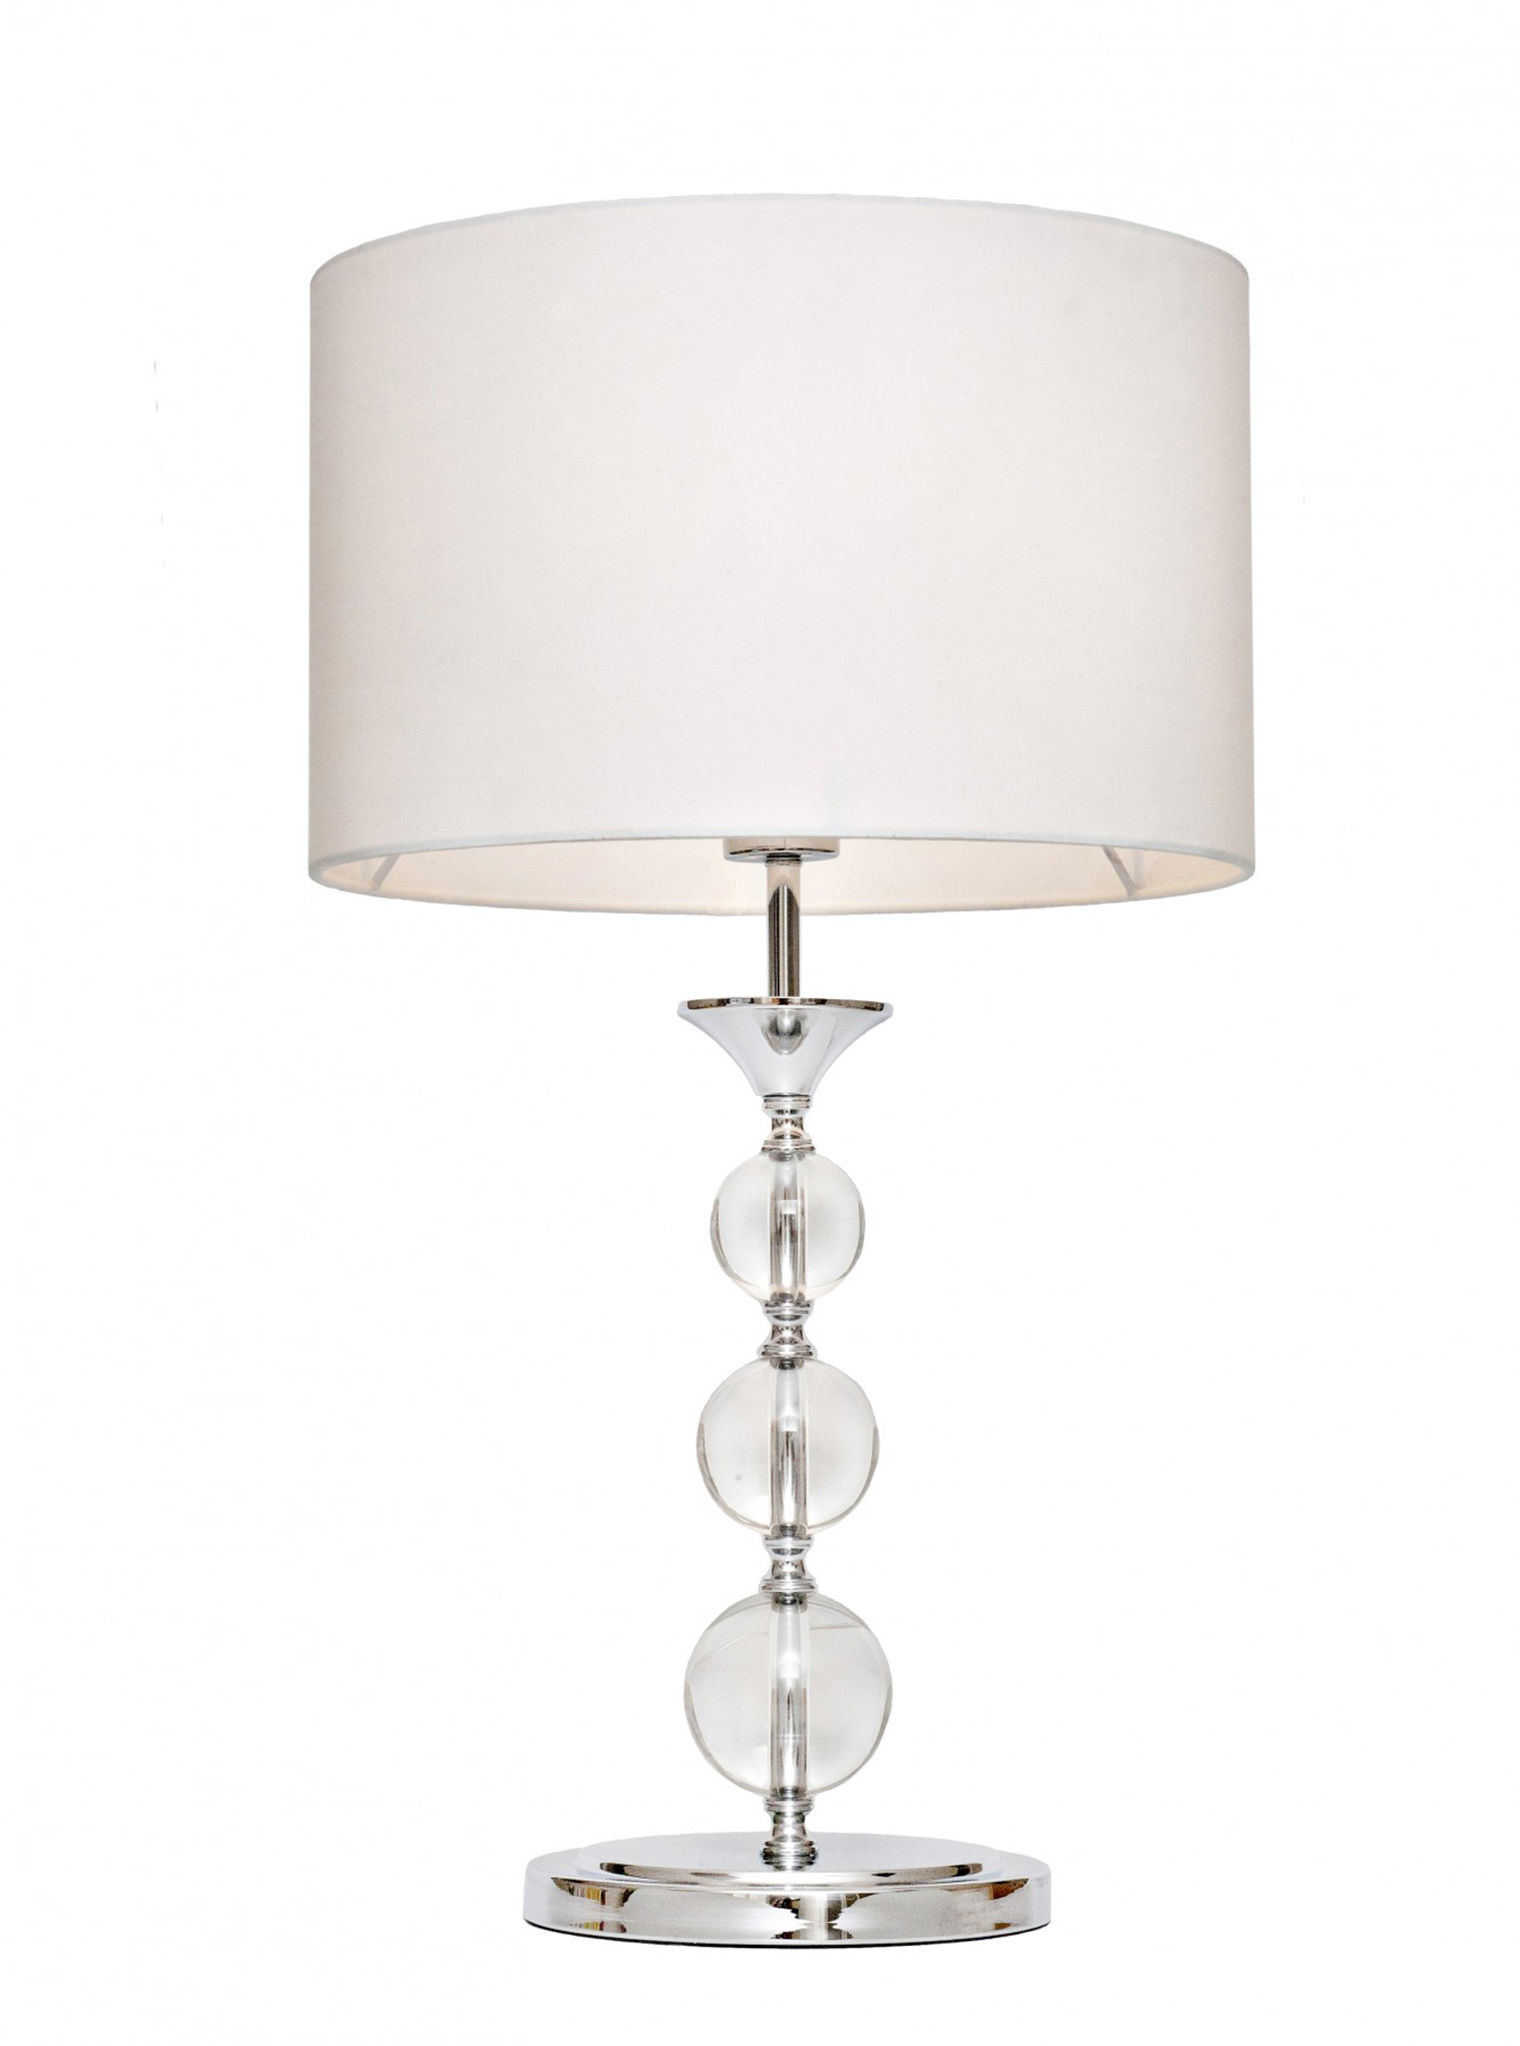 RLT93163-1W REA II LAMPA STOŁOWA